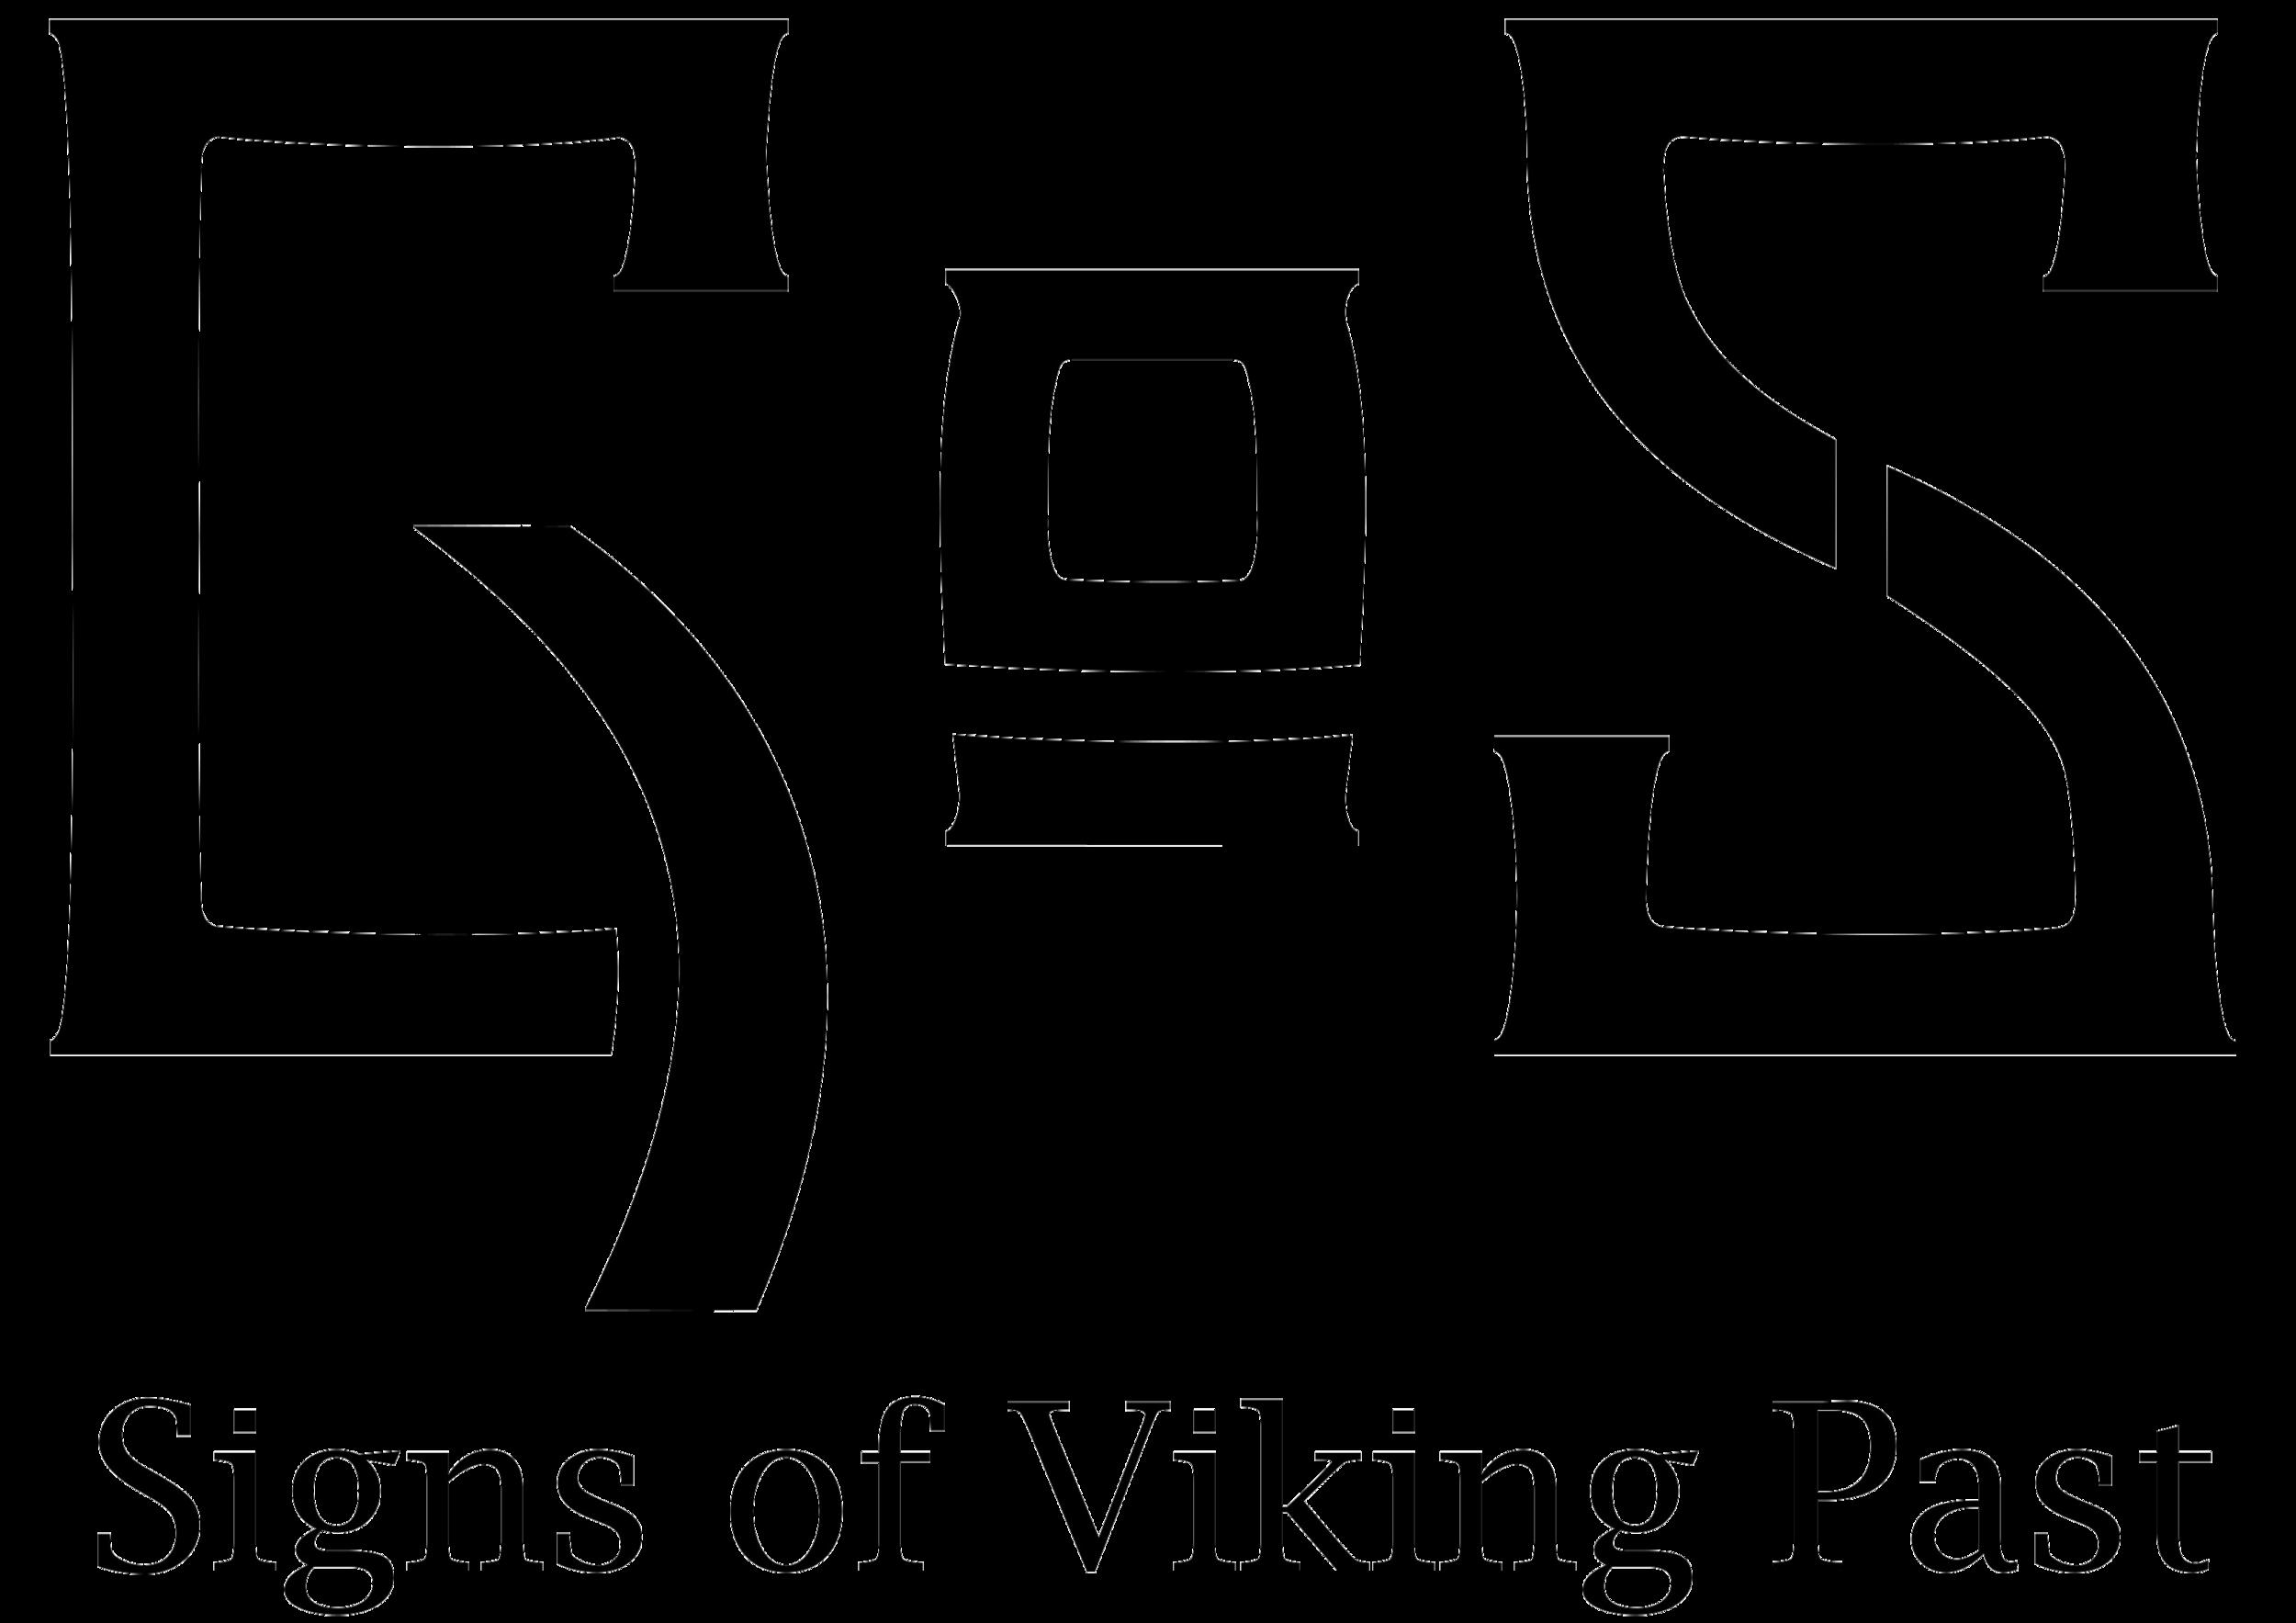 GoS Logo - Signs of Viking Past 2.png